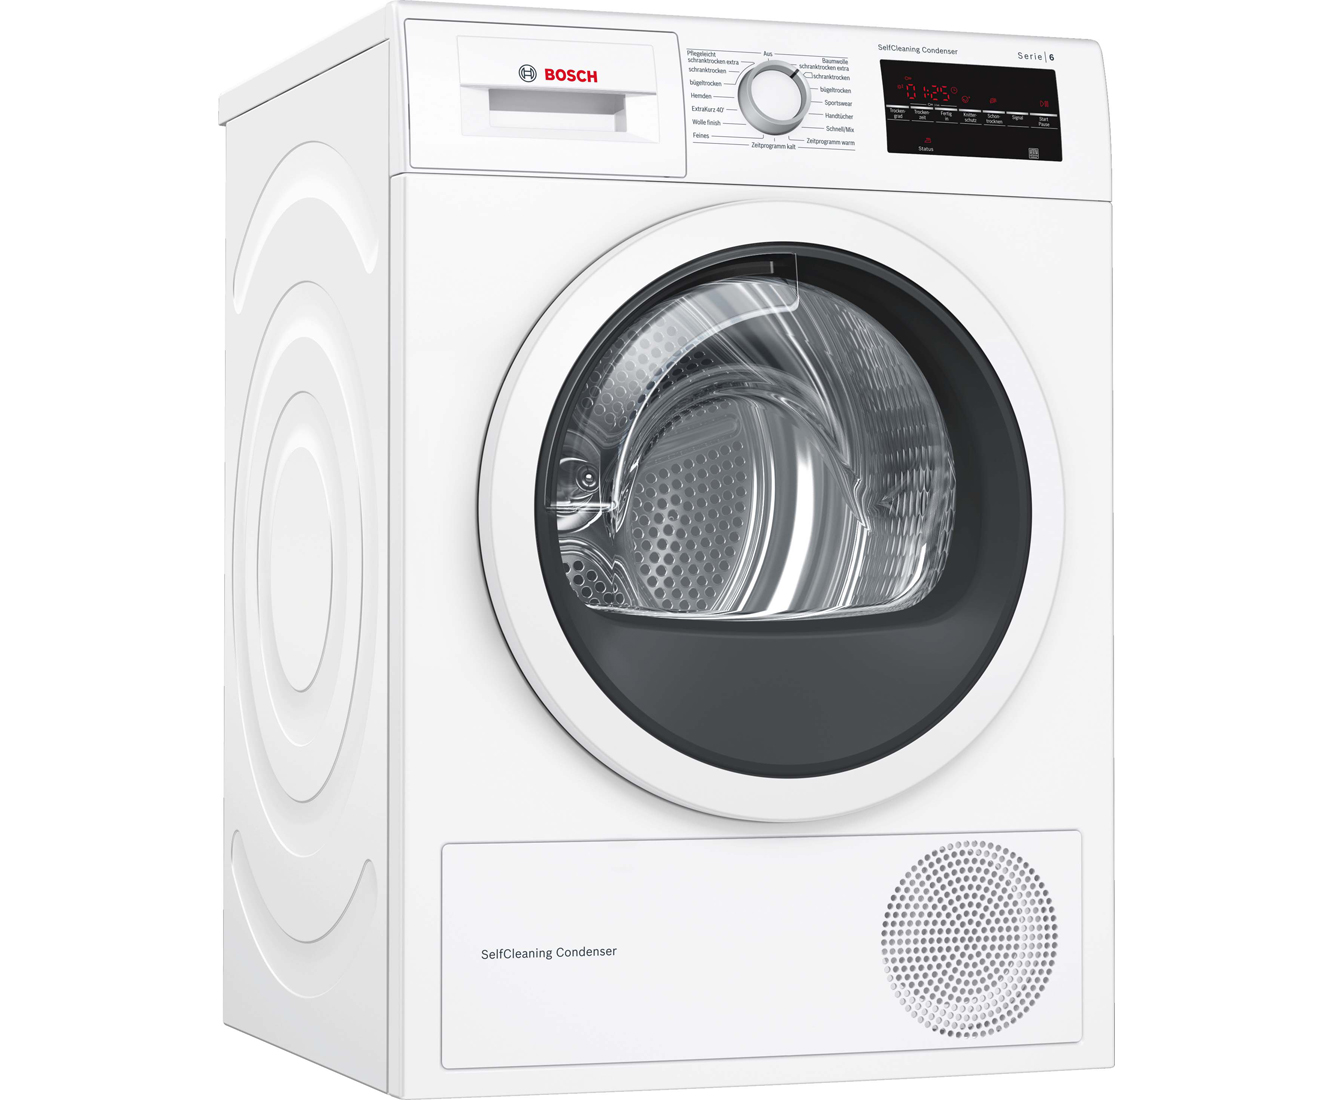 Bosch Serie 6 WTW854KA Wärmepumpentrockner - Weiß | Bad > Waschmaschinen und Trockner > Wärmepumpentrockner | Weiß | Bosch